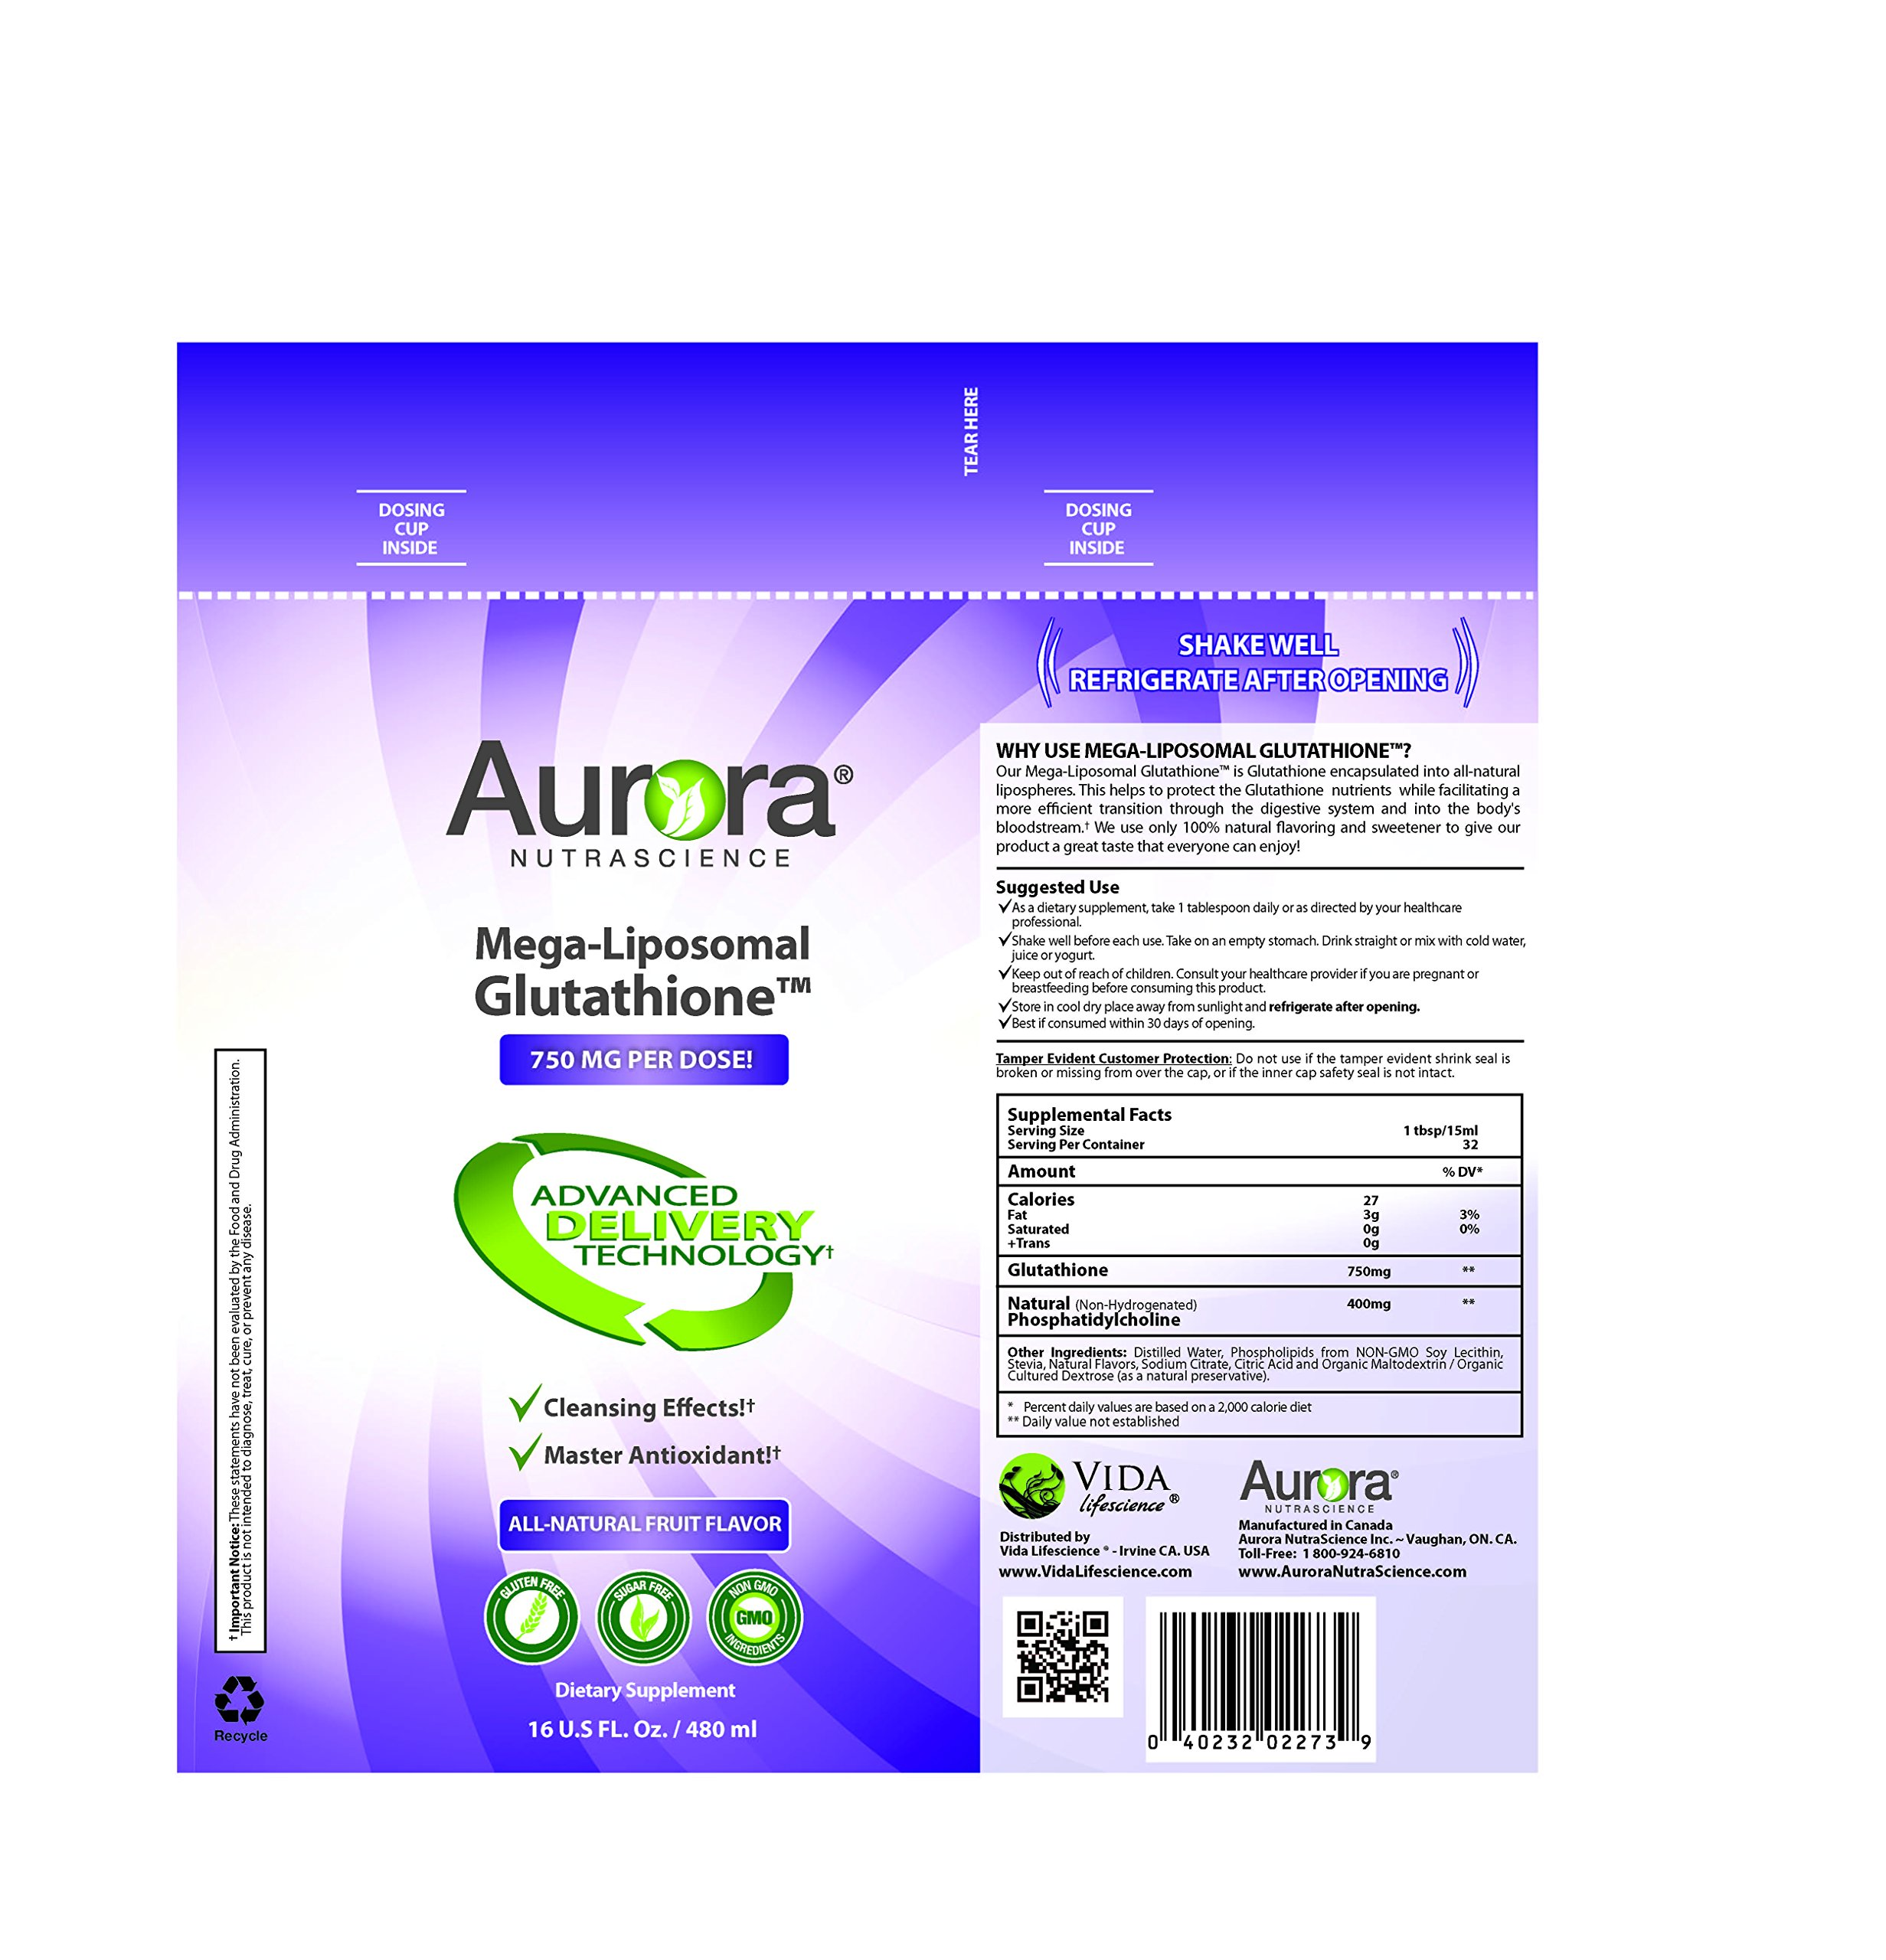 Aurora Nutrascience Mega-Liposomal Glutathione 16 oz